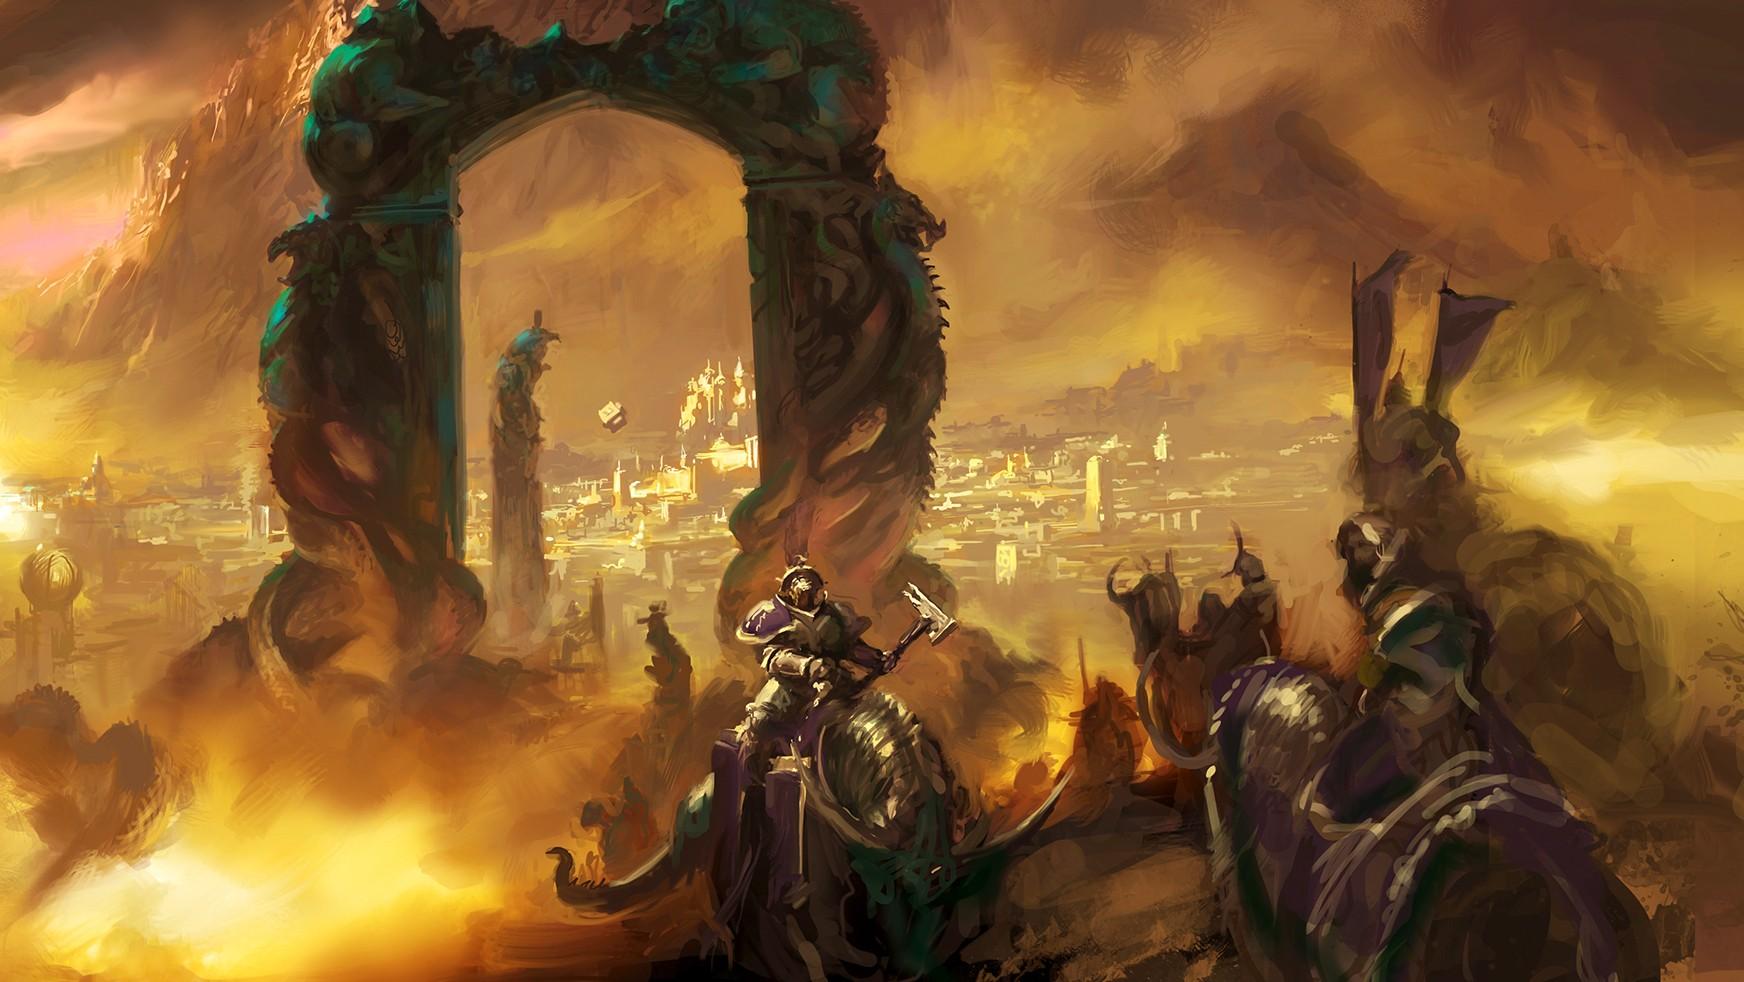 Wallpaper Age Of Sigmar Warhammer Malign Portents Fantasy Art